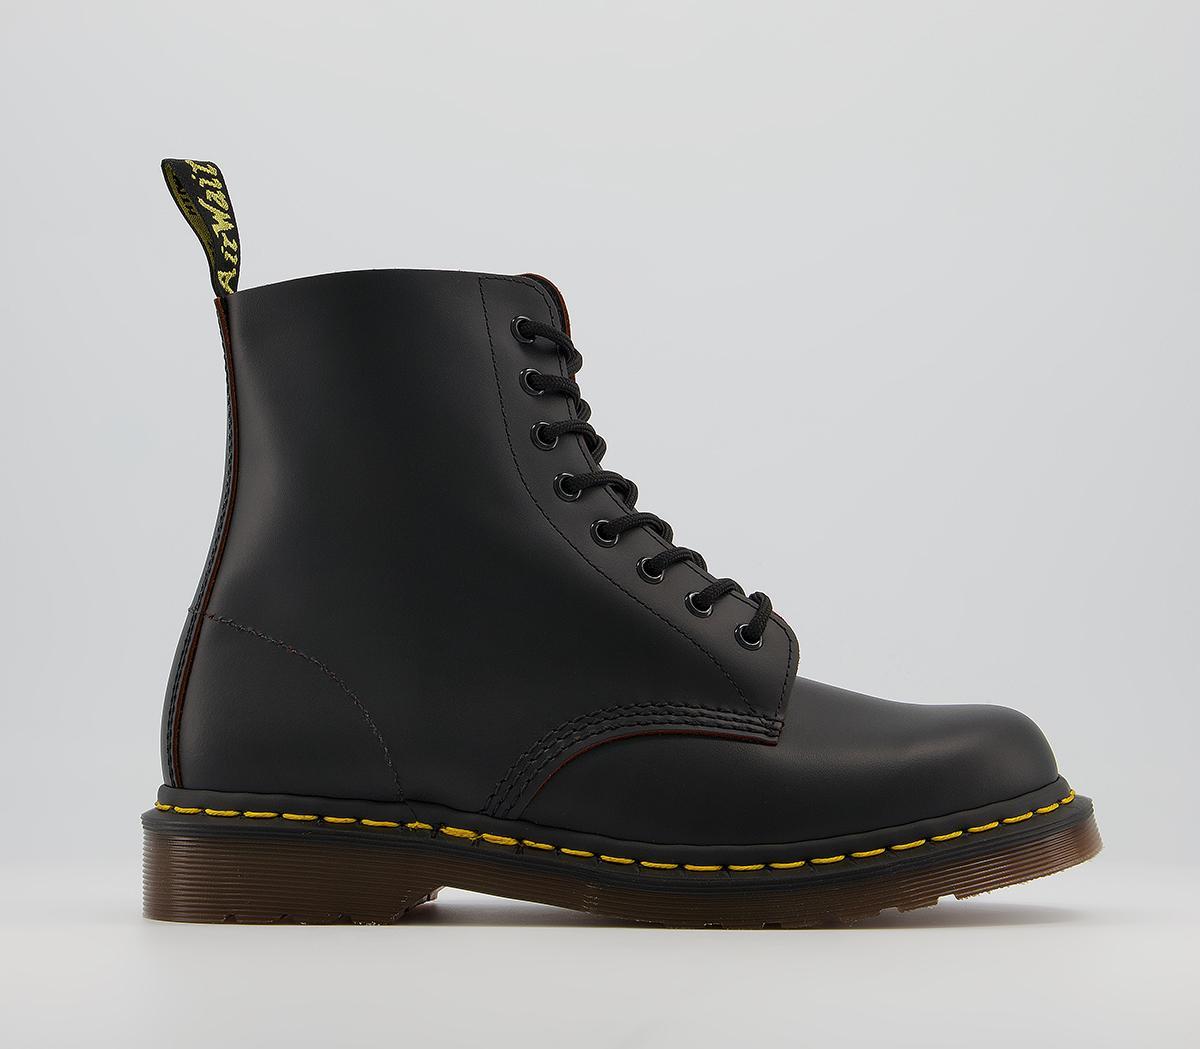 Vintage 1460 8 Eye Boots